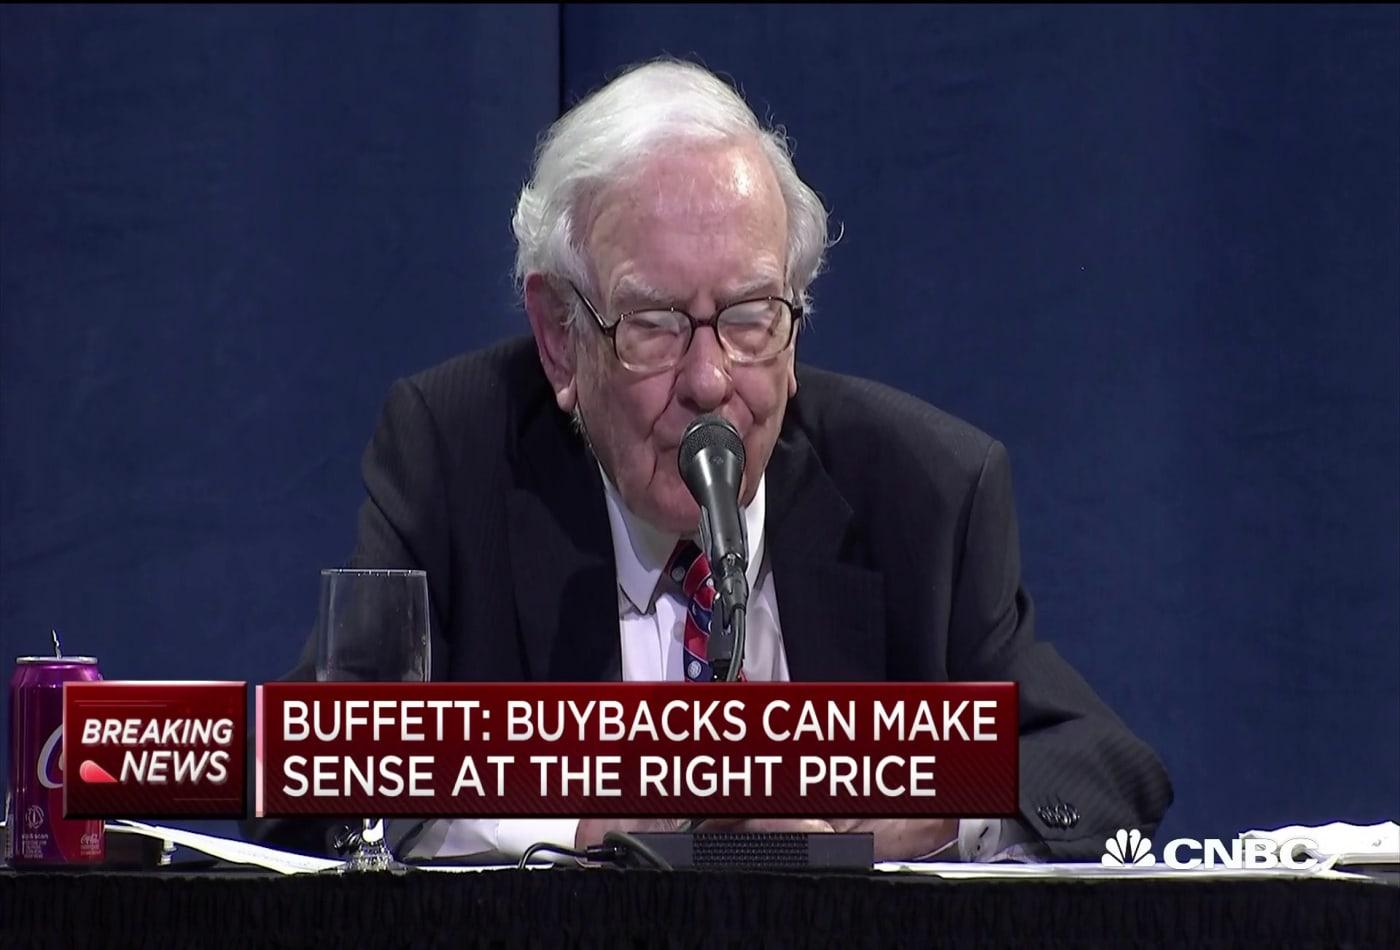 Warren Buffett: Buybacks can make sense at the right price